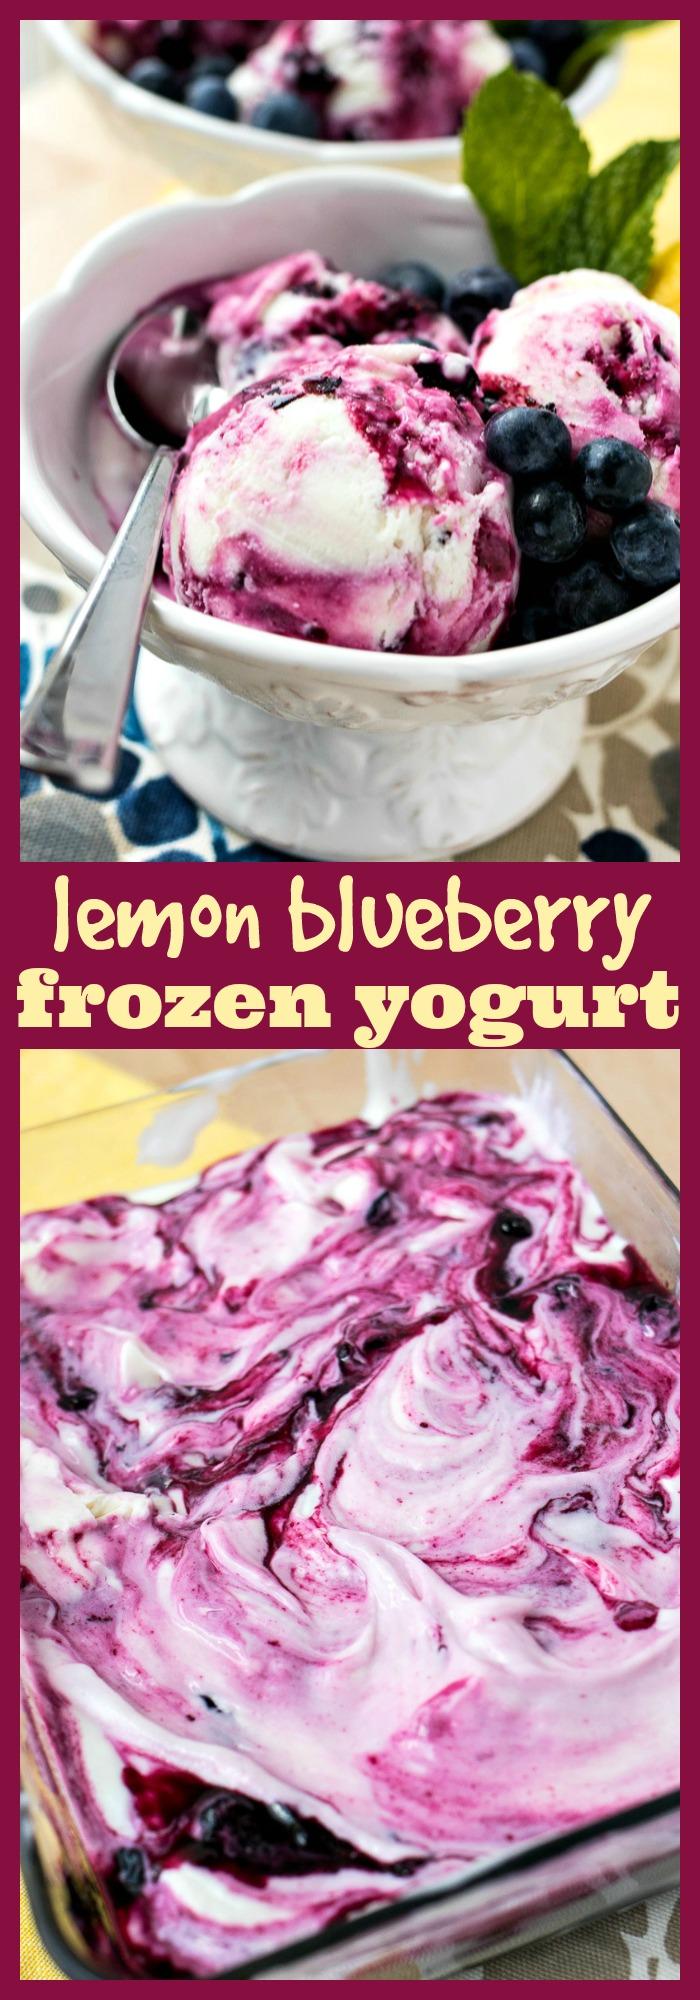 Lemon Blueberry Frozen Yogurt photo collage